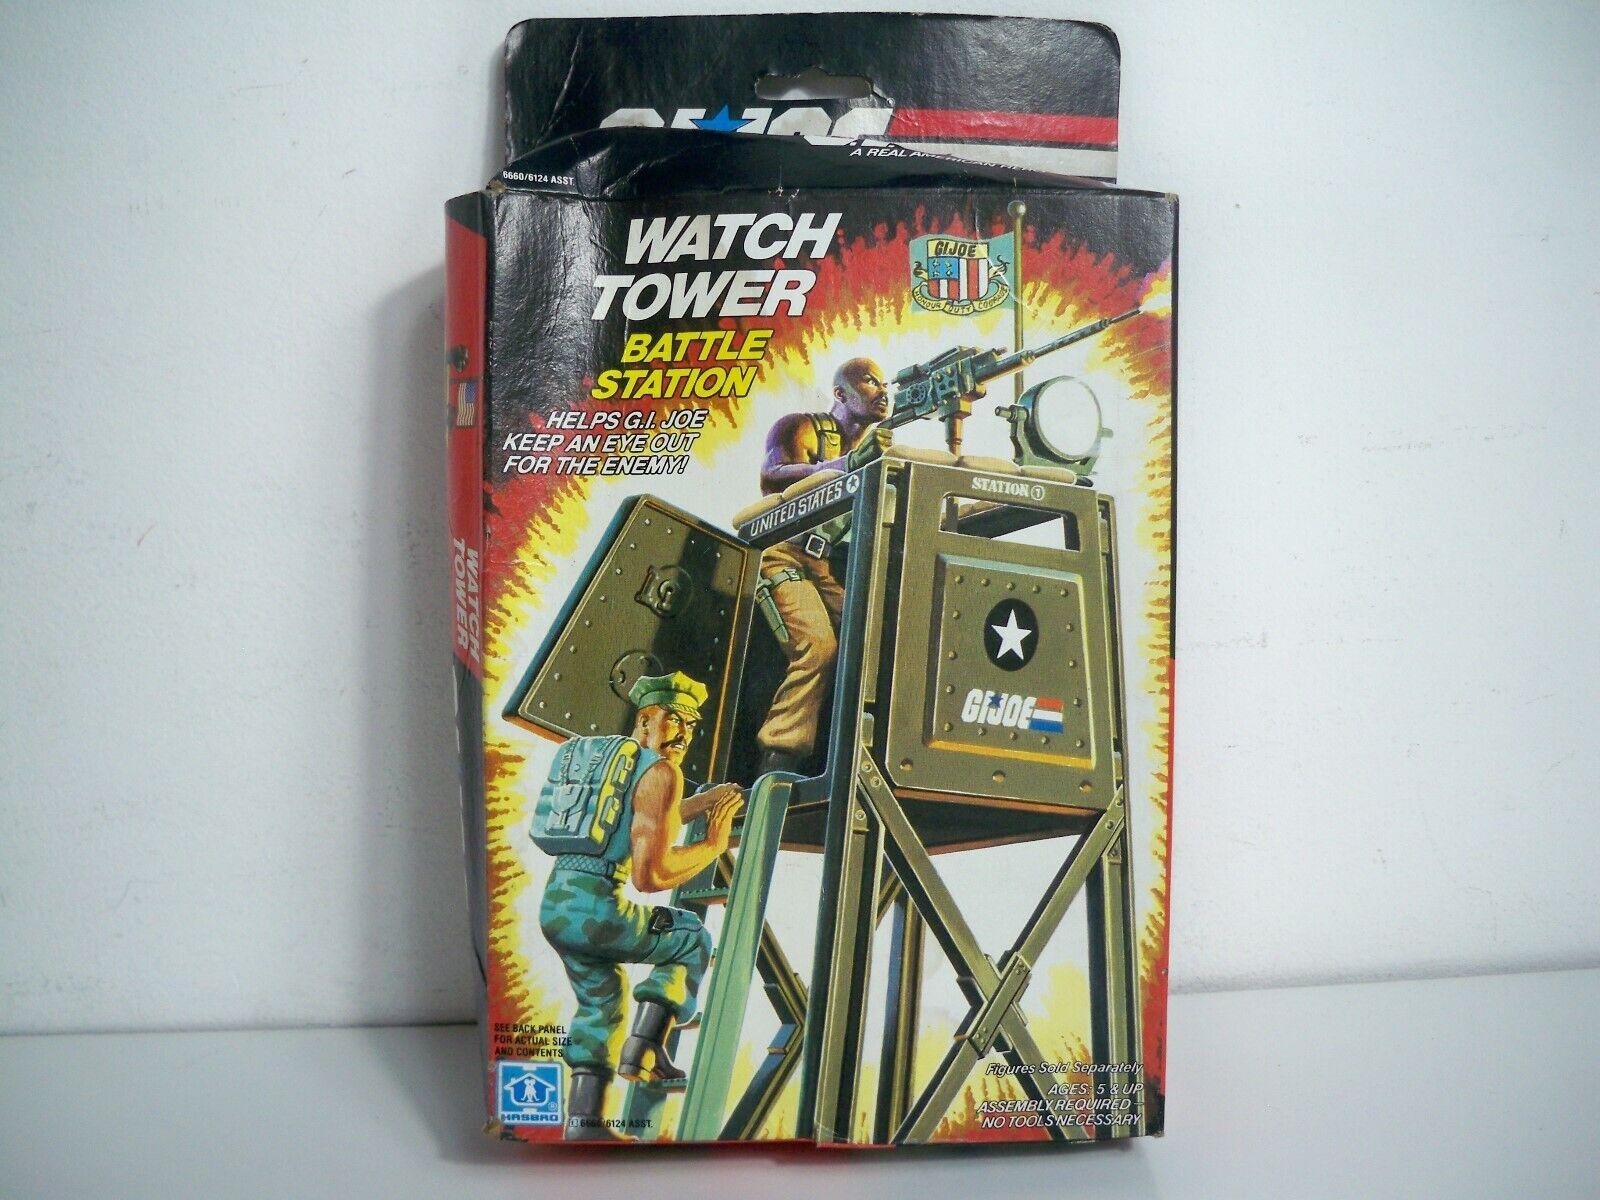 K1905721 WATCH TOWER MISB MINT IN SEALED BOX 1984 GI JOE ORIGINAL VINTAGE